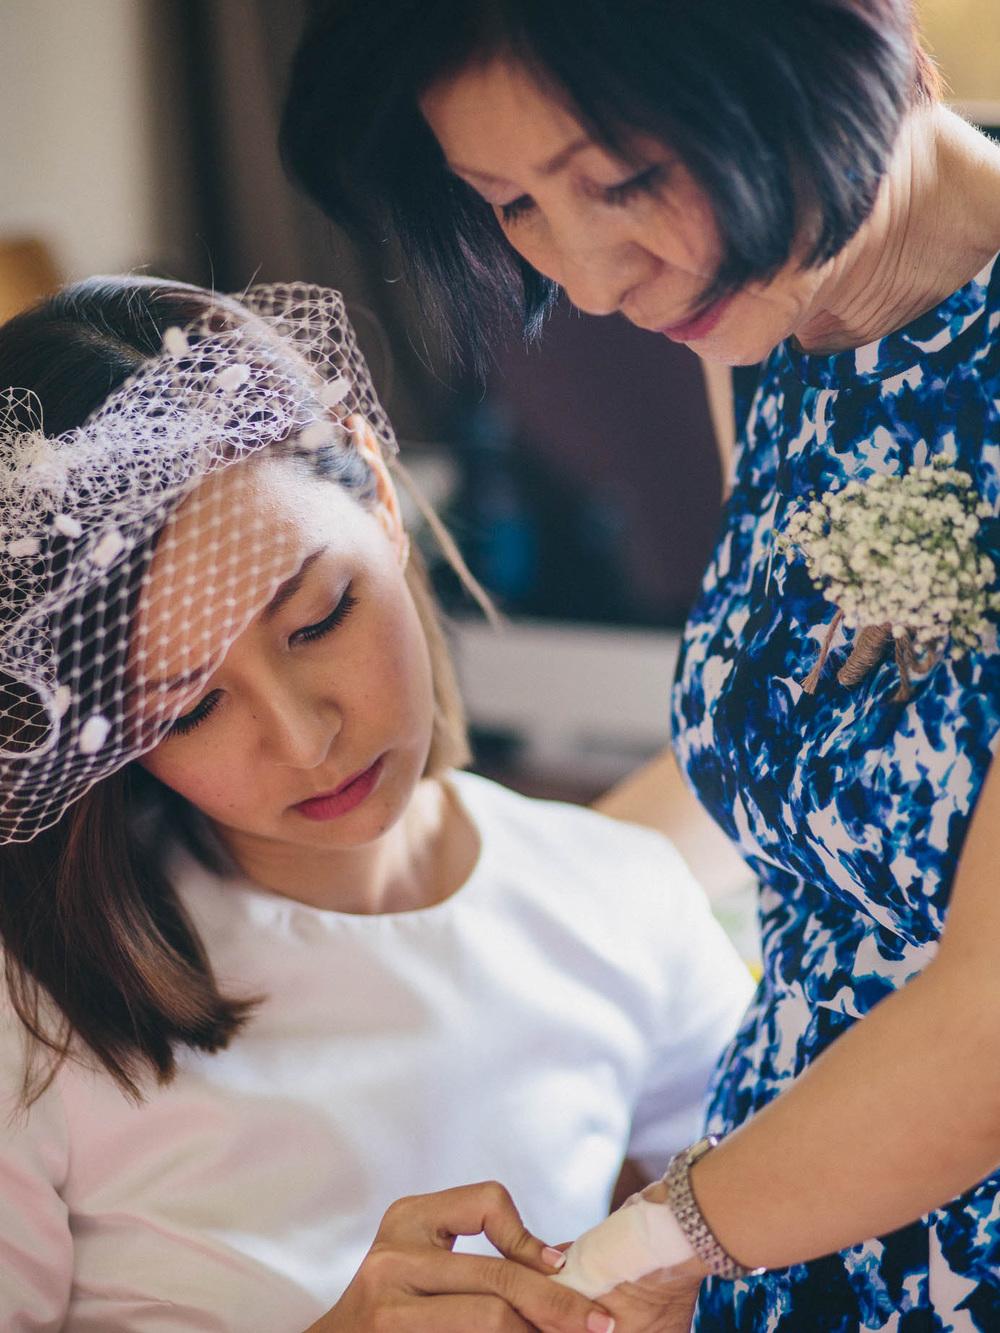 singapore-wedding-photographer-malay-indian-pre-wedding-travel-wmt-2015-alif-ethel-11.jpg